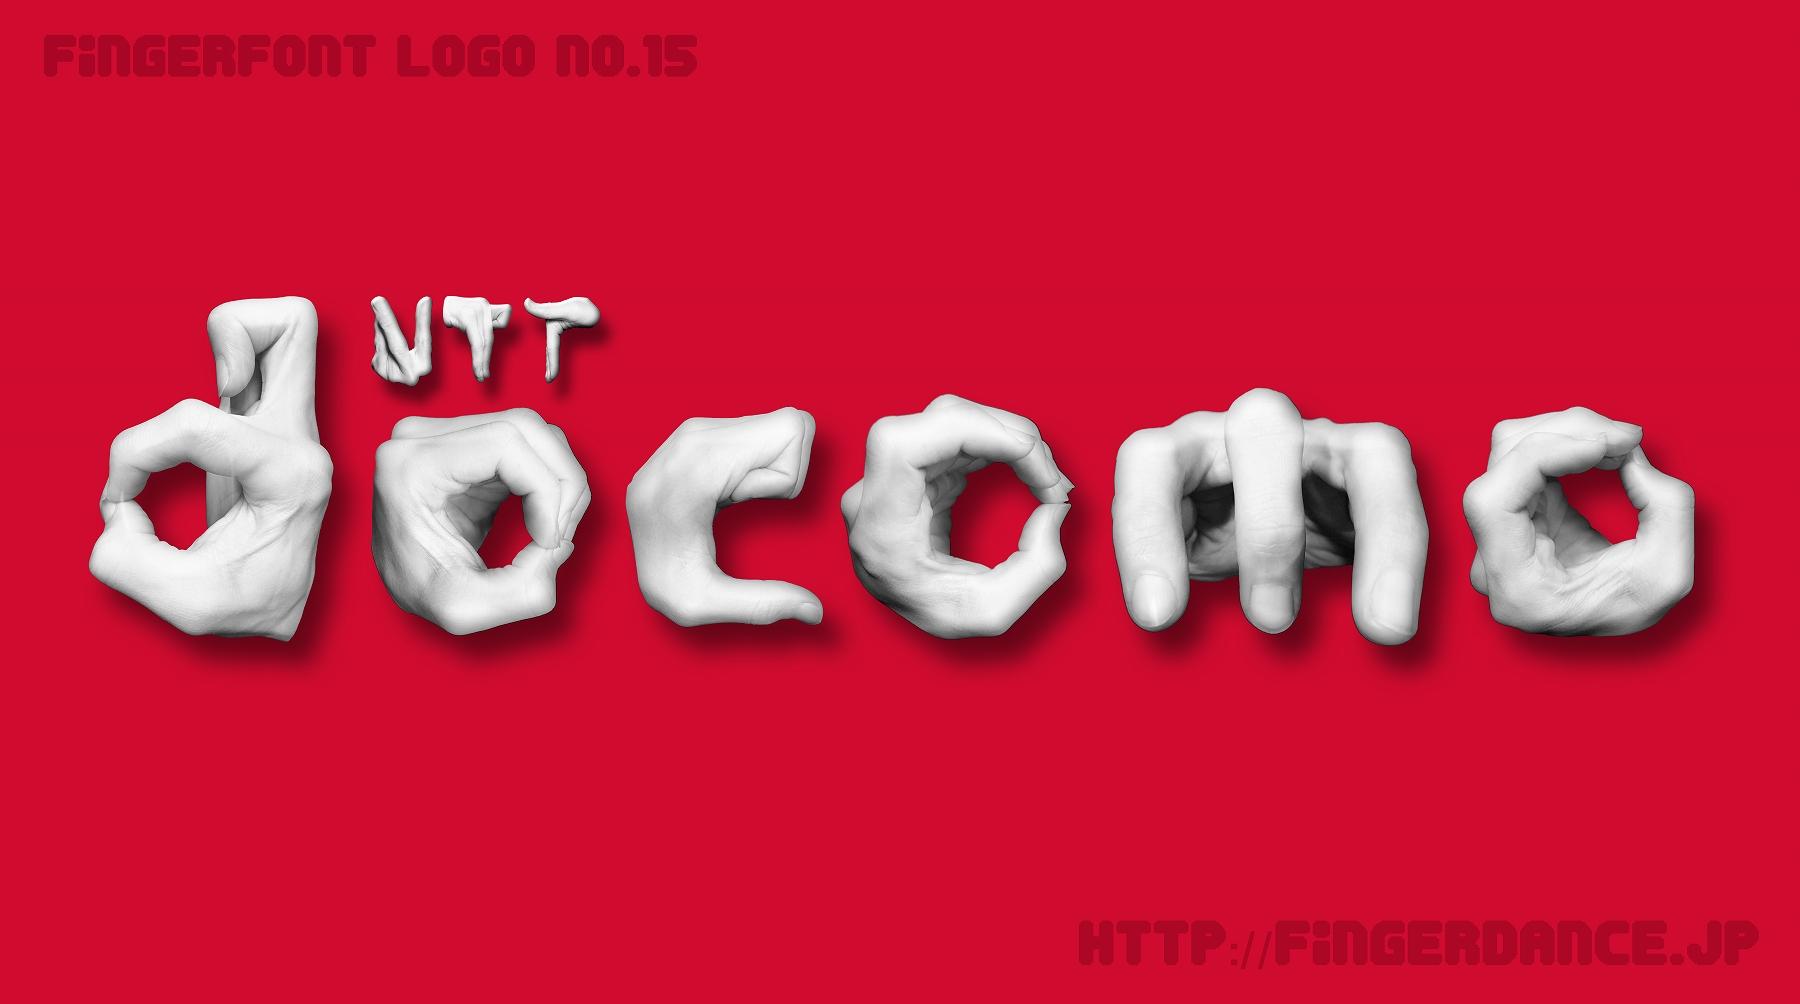 ntt-docomo-fingerhttp://fingerdance.jp/L/logohand ドコモフィンガーロゴハンド手指